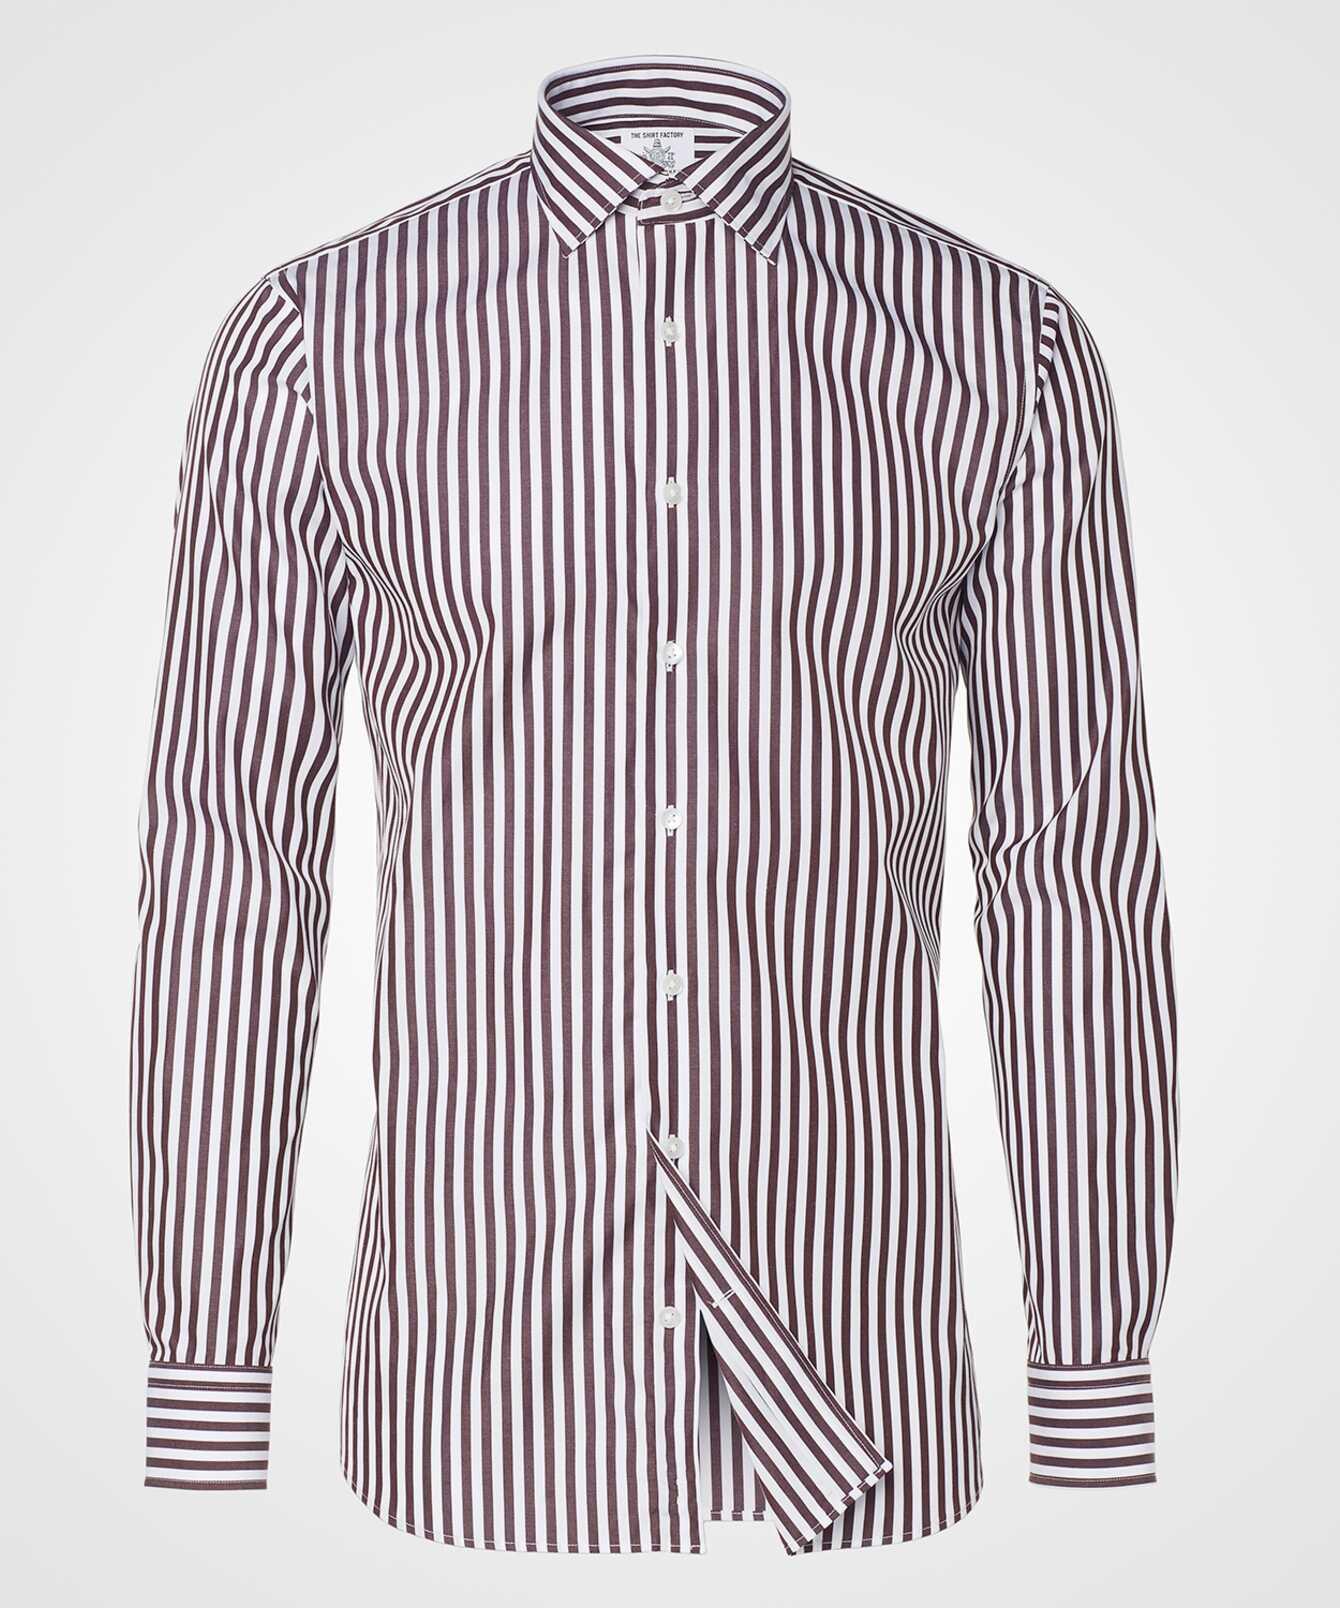 Skjorta E I New York The Shirt Factory